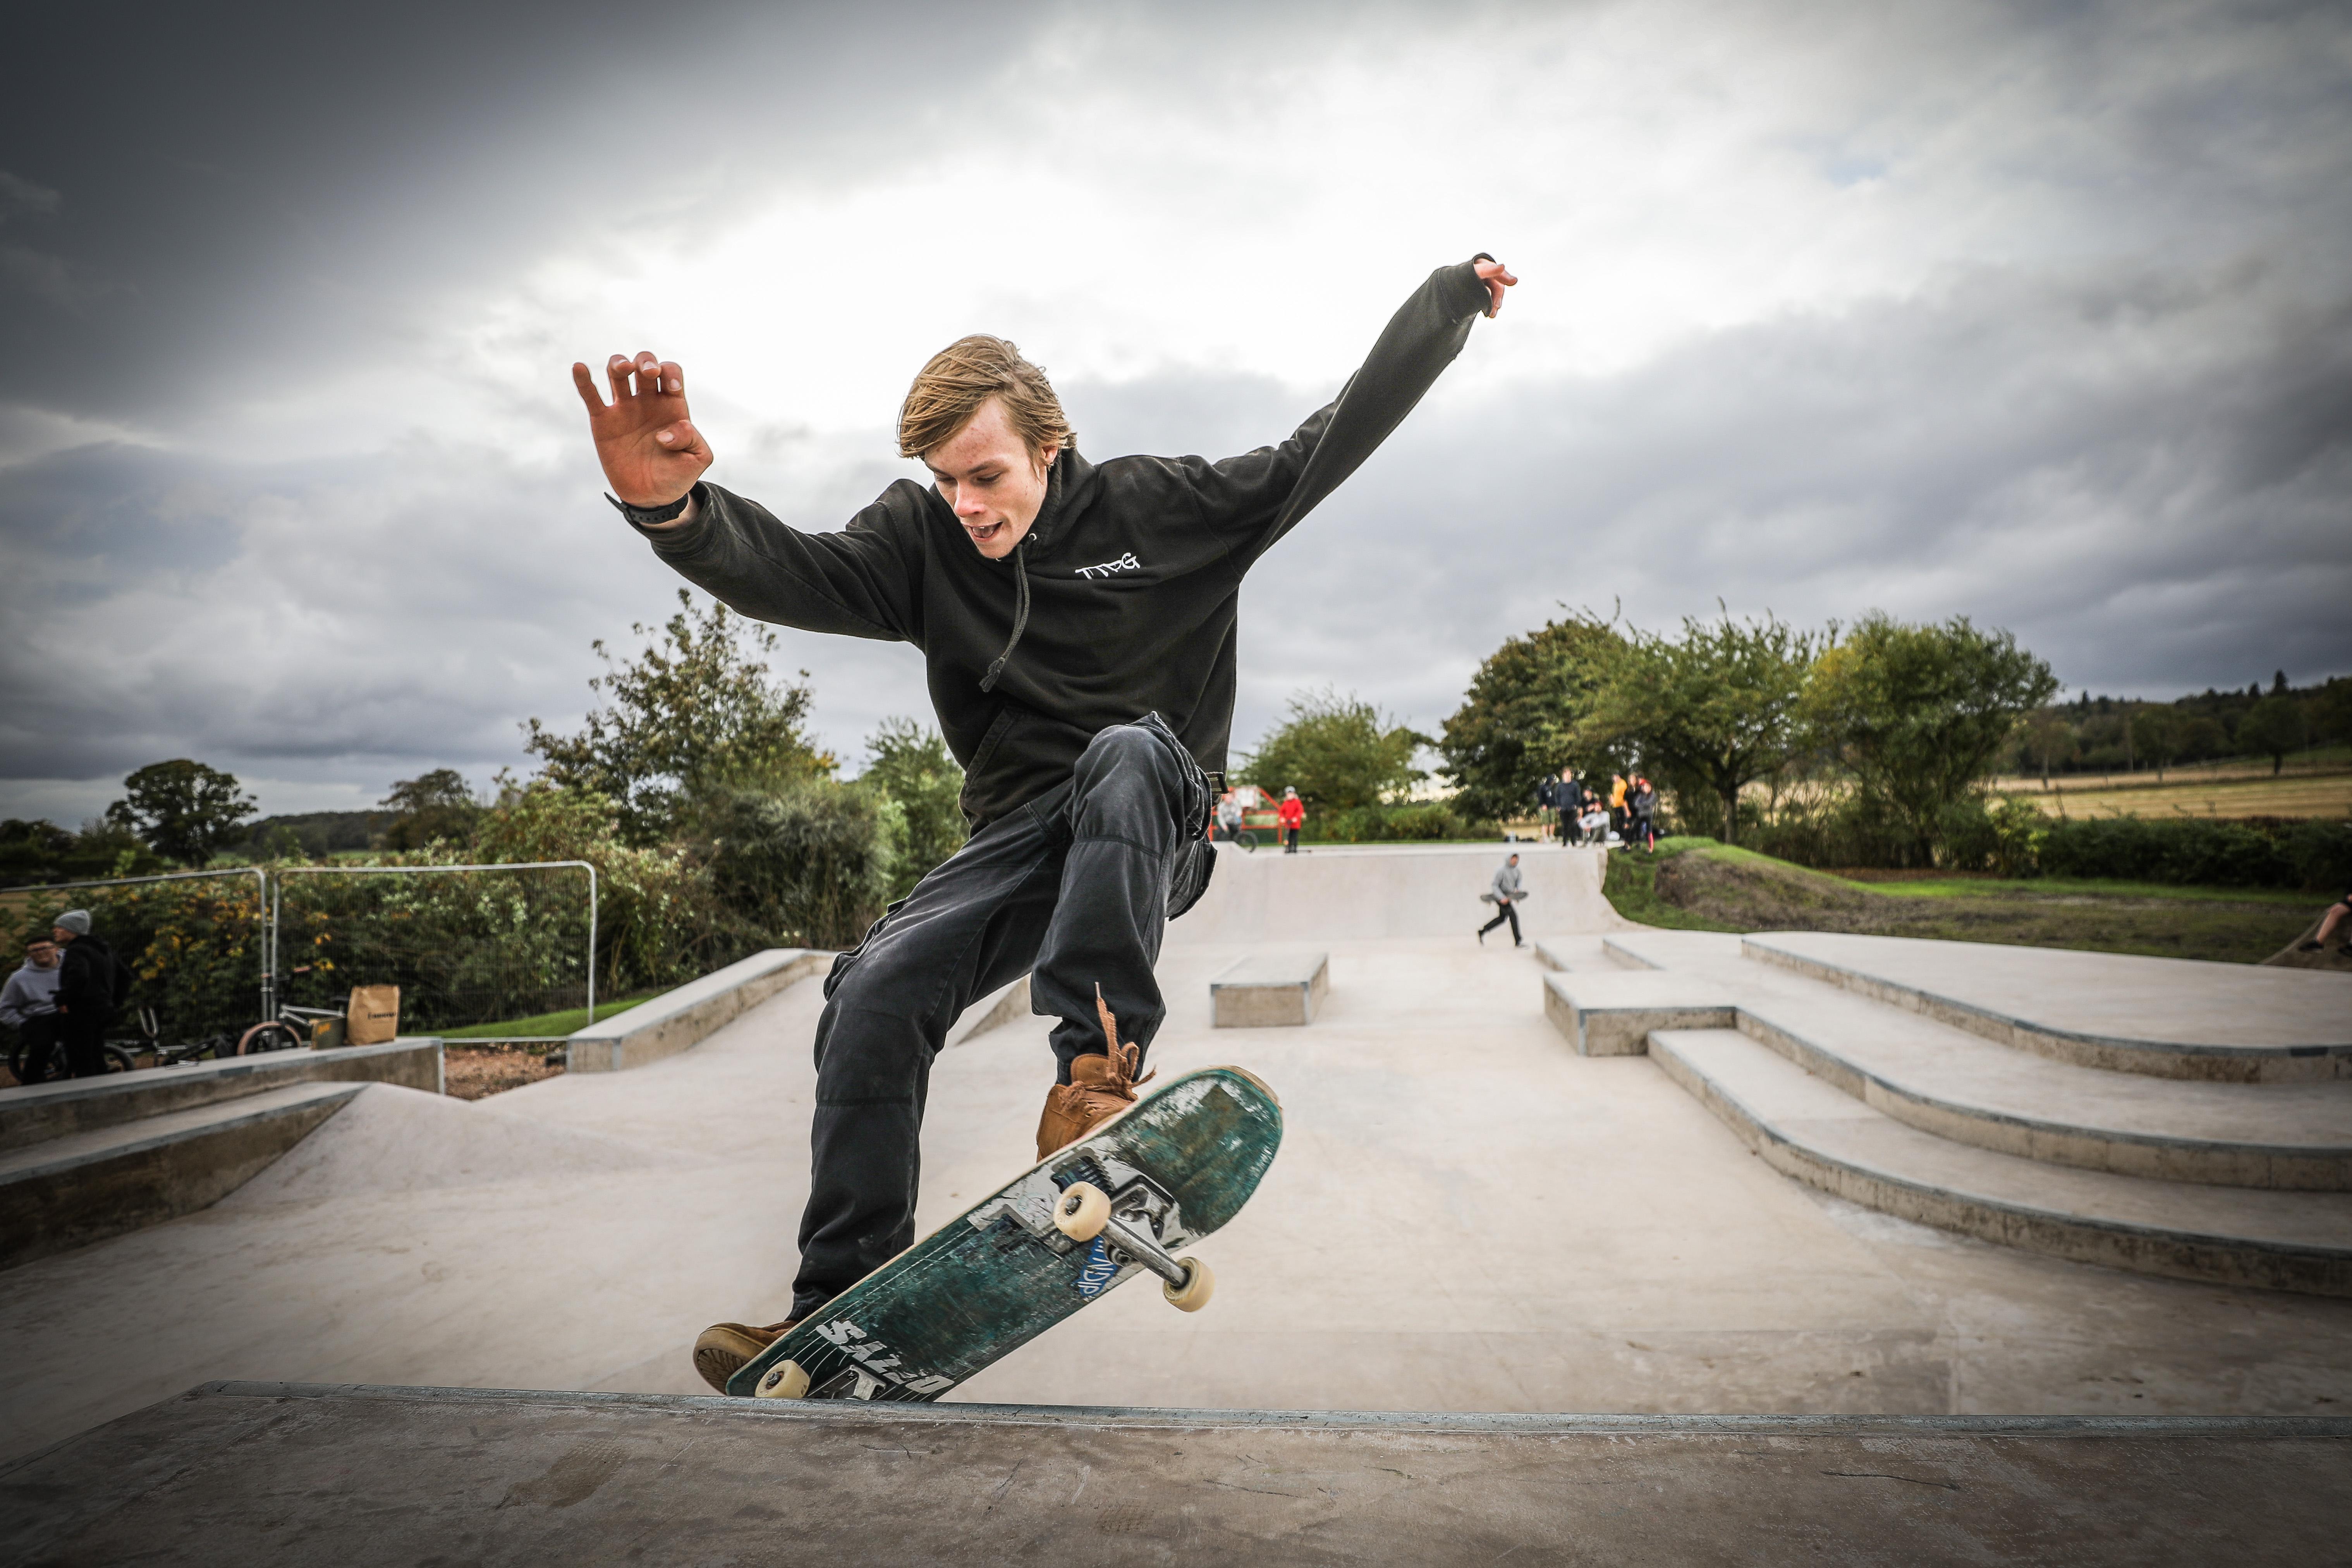 Adam Penman, Tayport Top Park Group chairman, tries out the new skatepark.